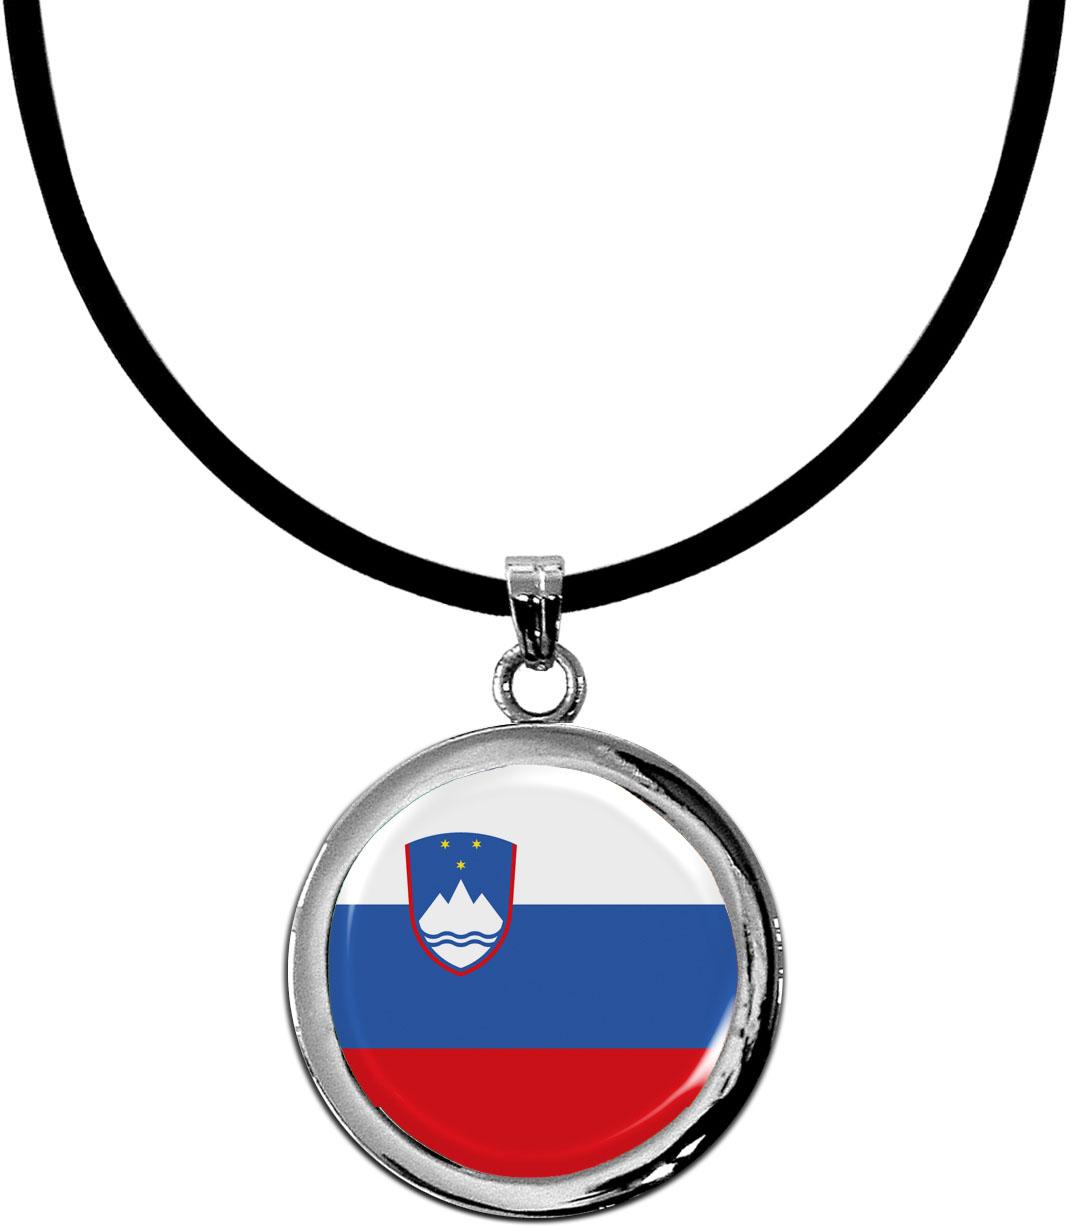 Kettenanhänger / Slowenien / Silikonband mit Silberverschluss